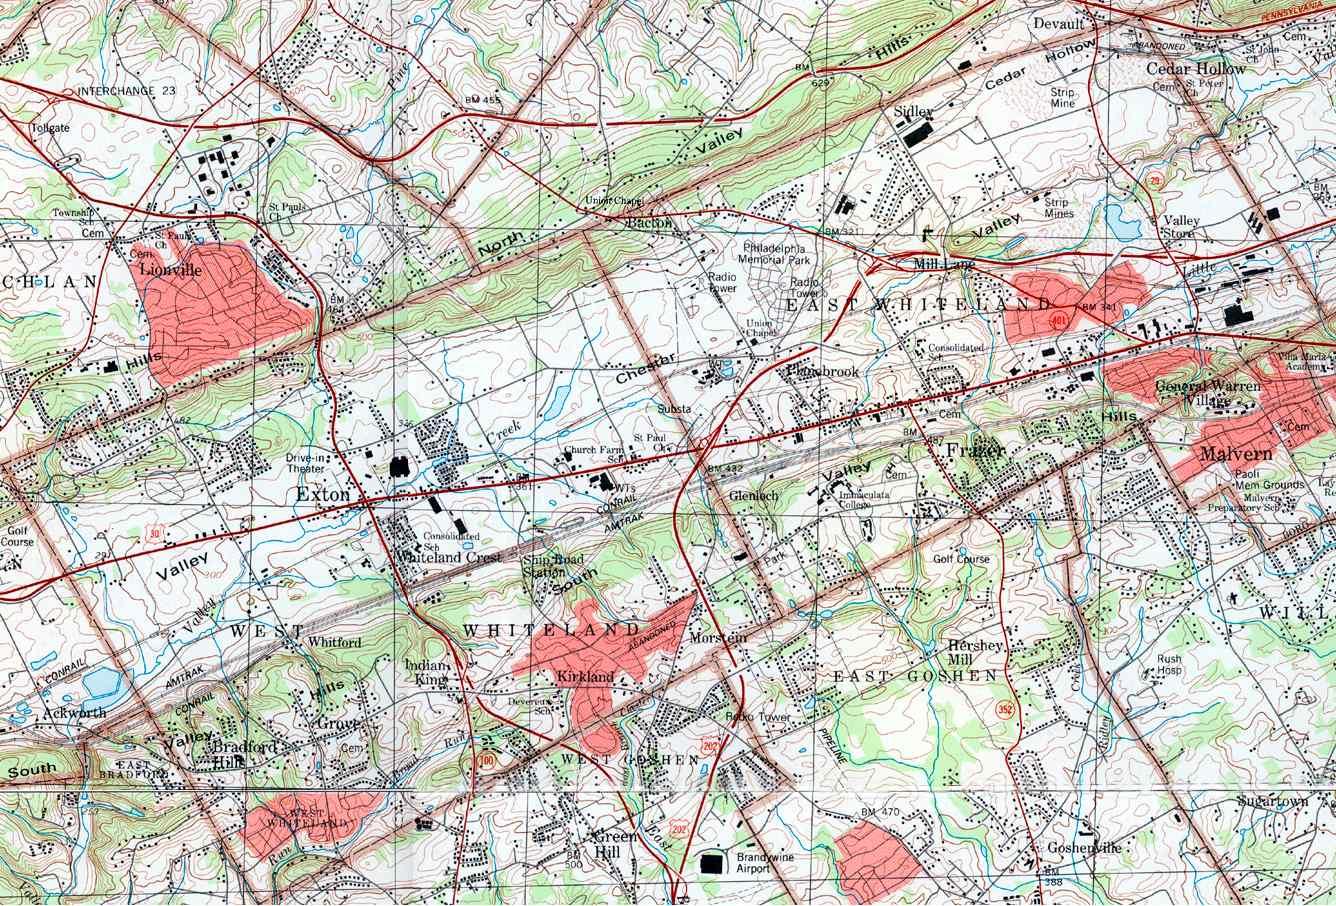 County Pennsylvania Township Maps - Malvern Pennsylvania On Us Map